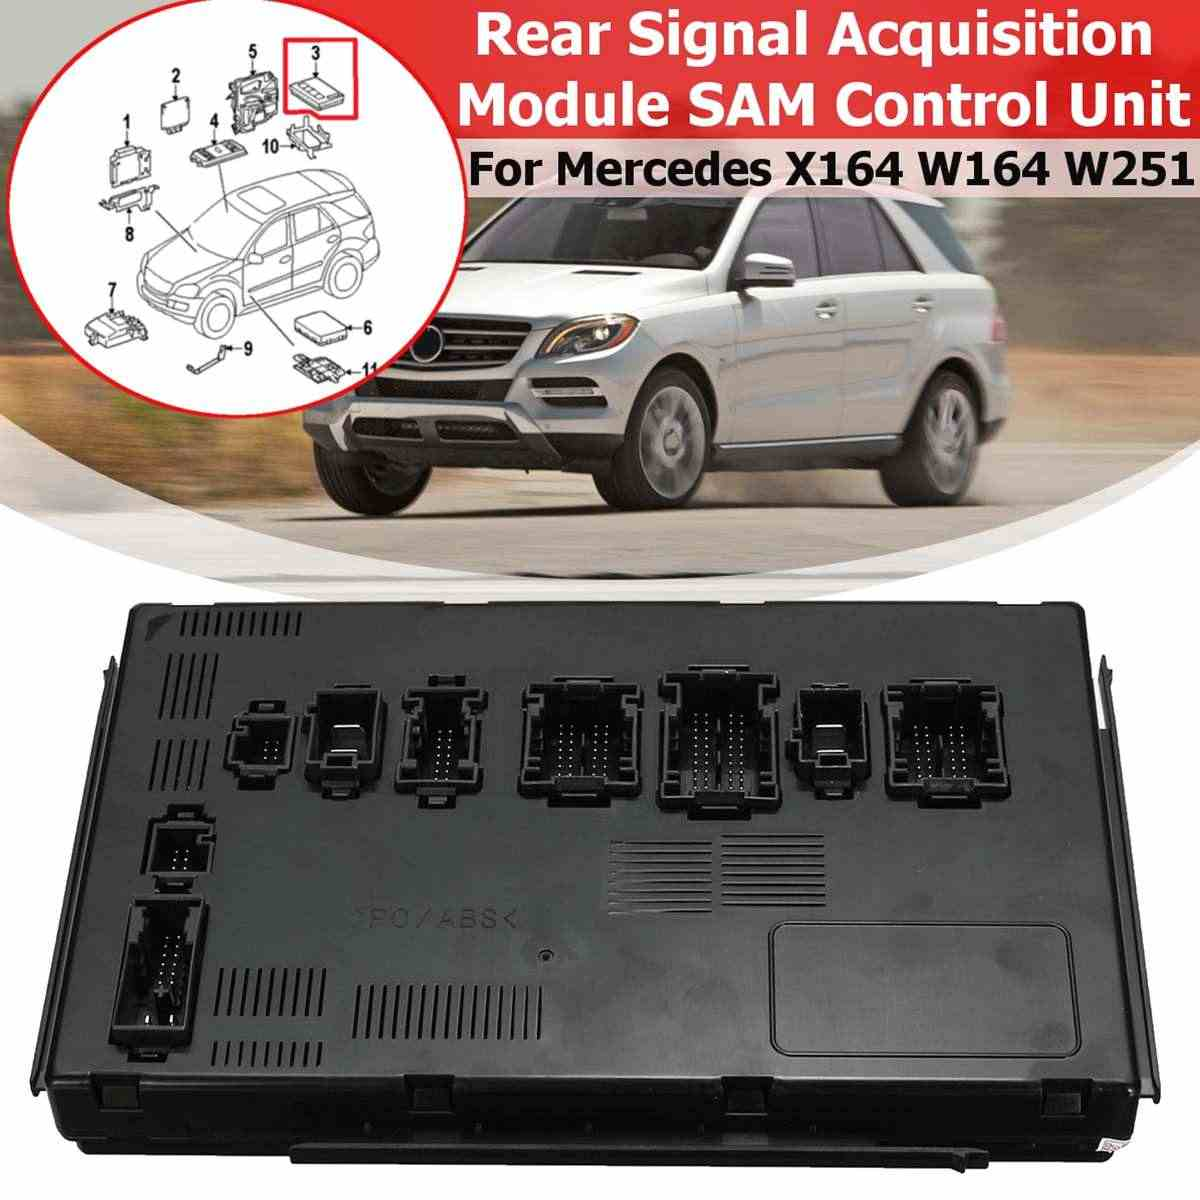 small resolution of 1pcs for mercedes benz x164 w164 w251 gl320 gl350 rear signal acquisition module sam control